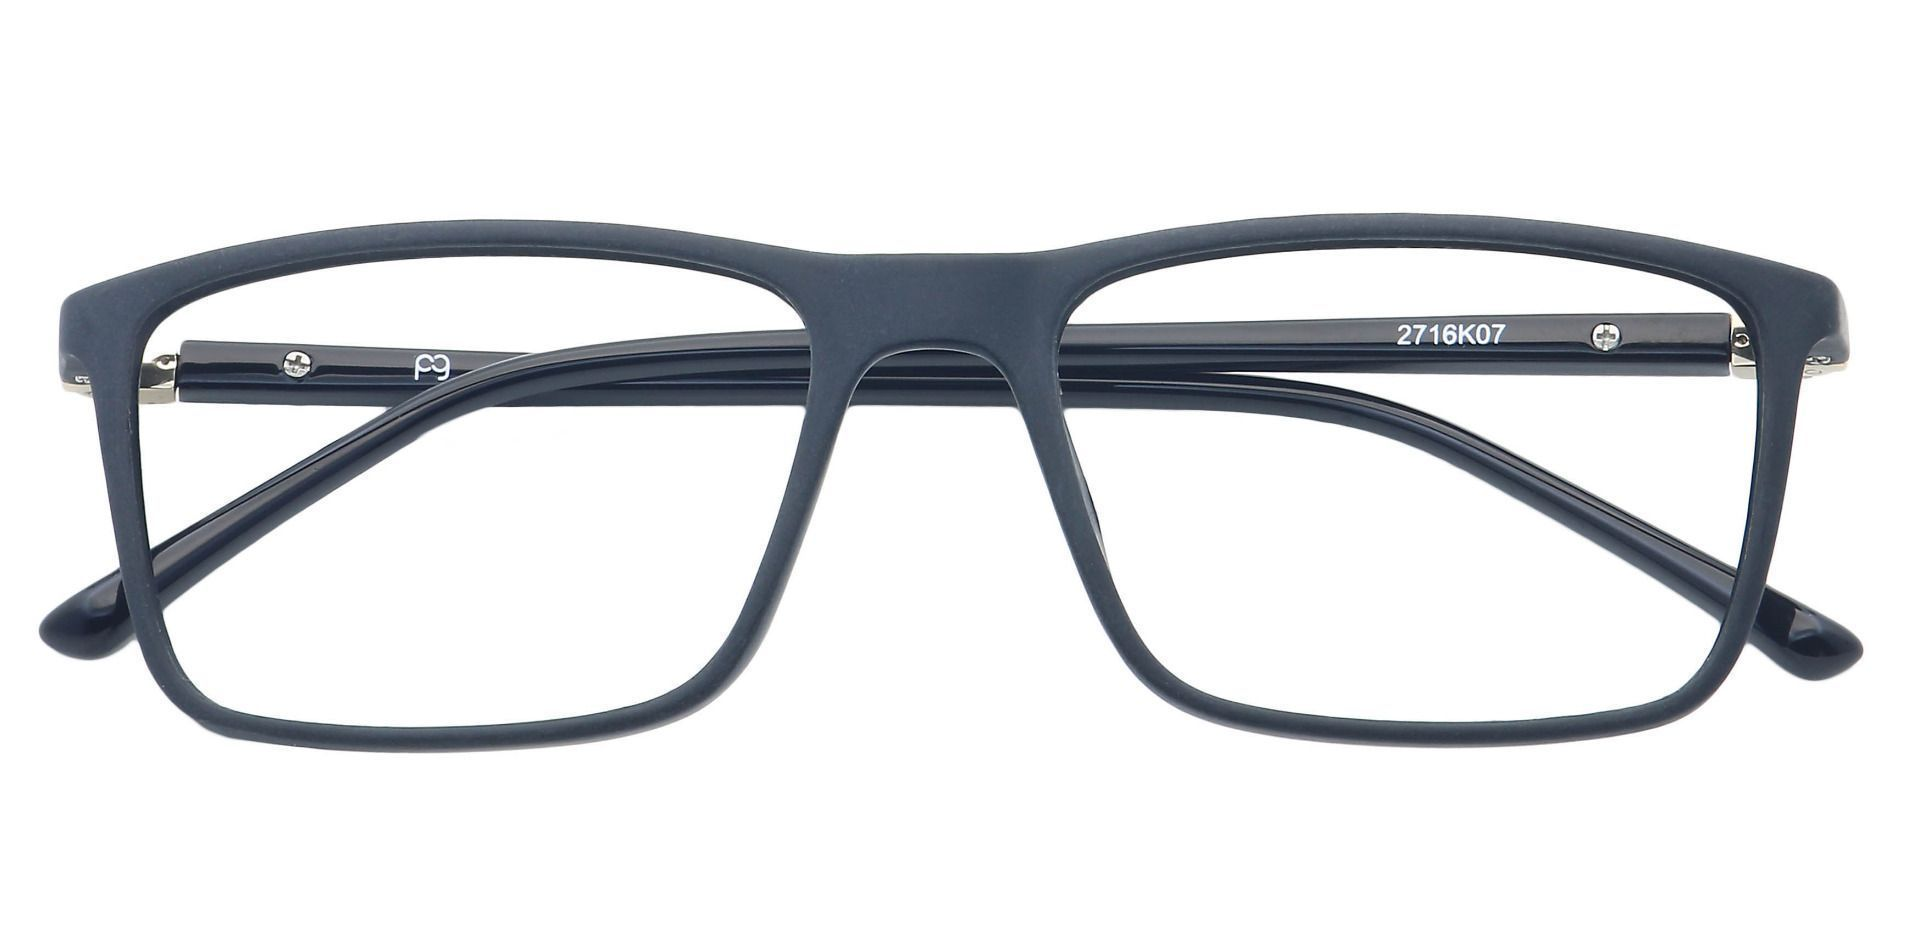 Quest Rectangle Lined Bifocal Glasses - Black